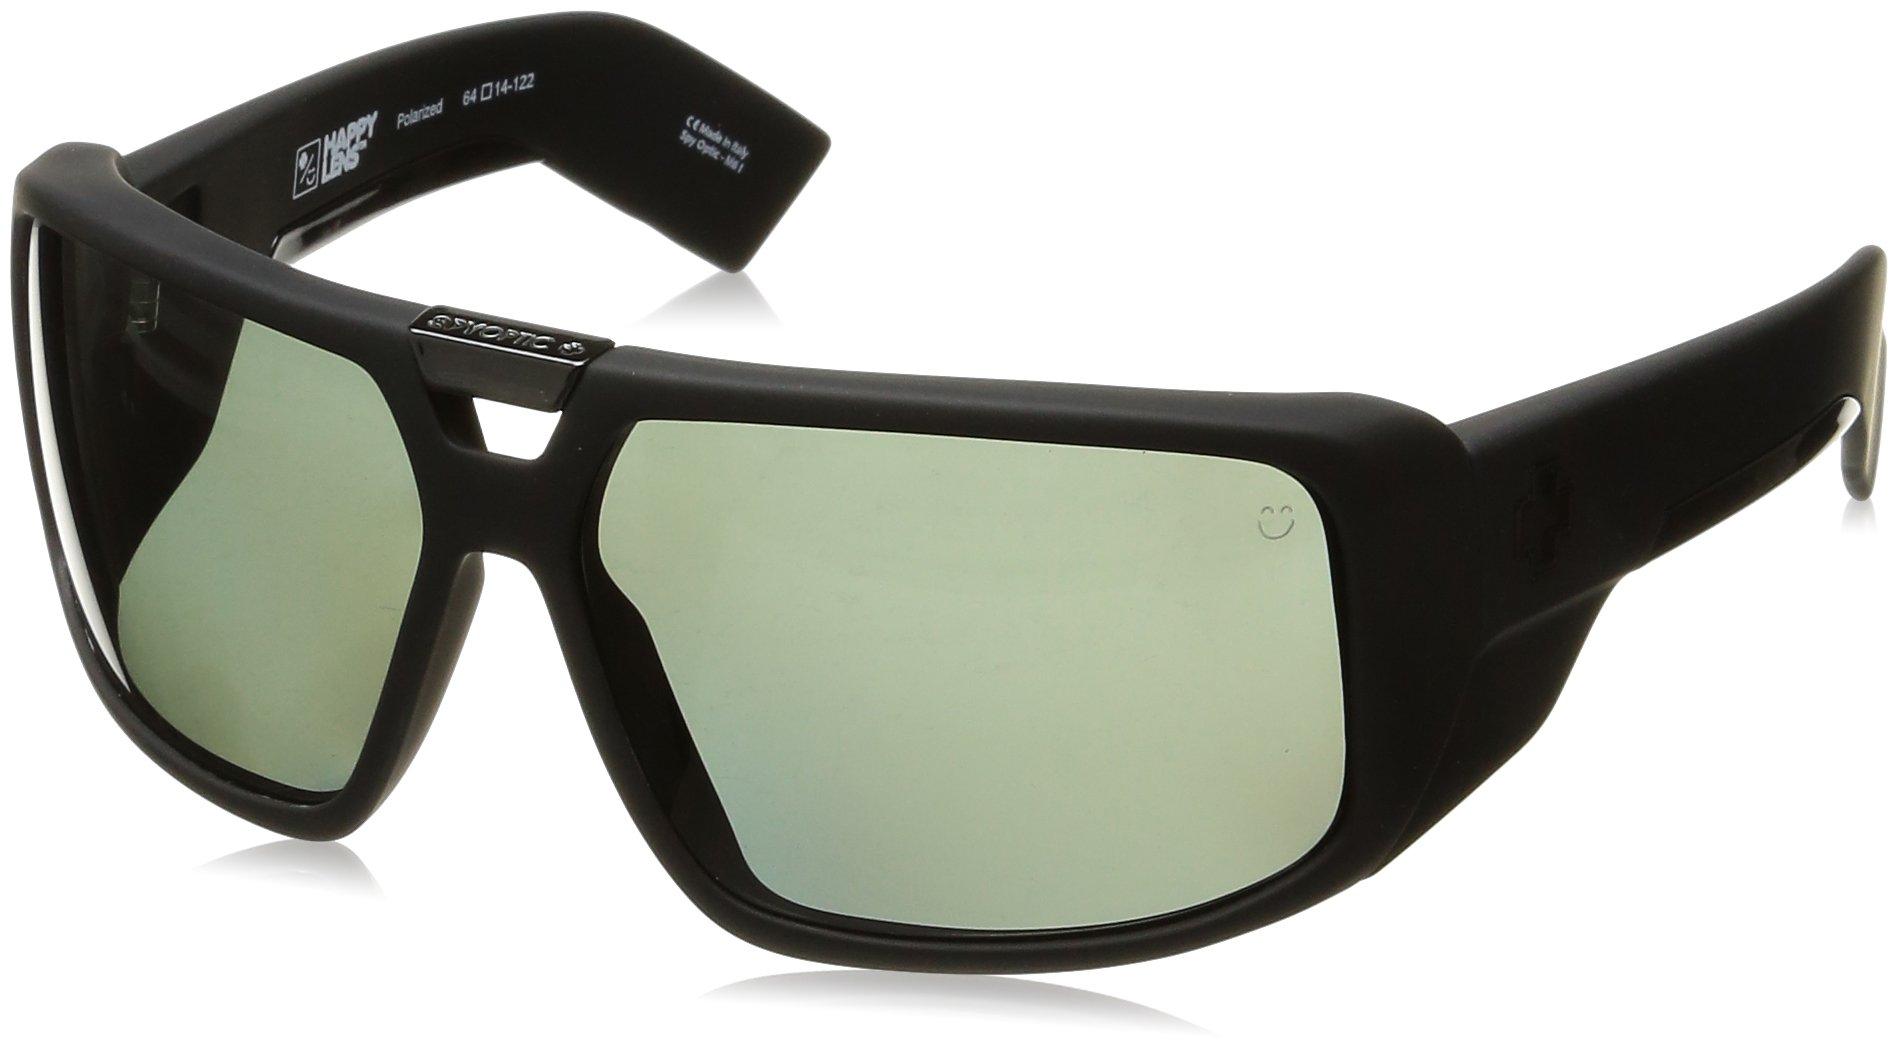 Spy Optic Touring Wrap Sunglasses, Soft Matte Black/Happy Gray/Green Polar, 64 mm